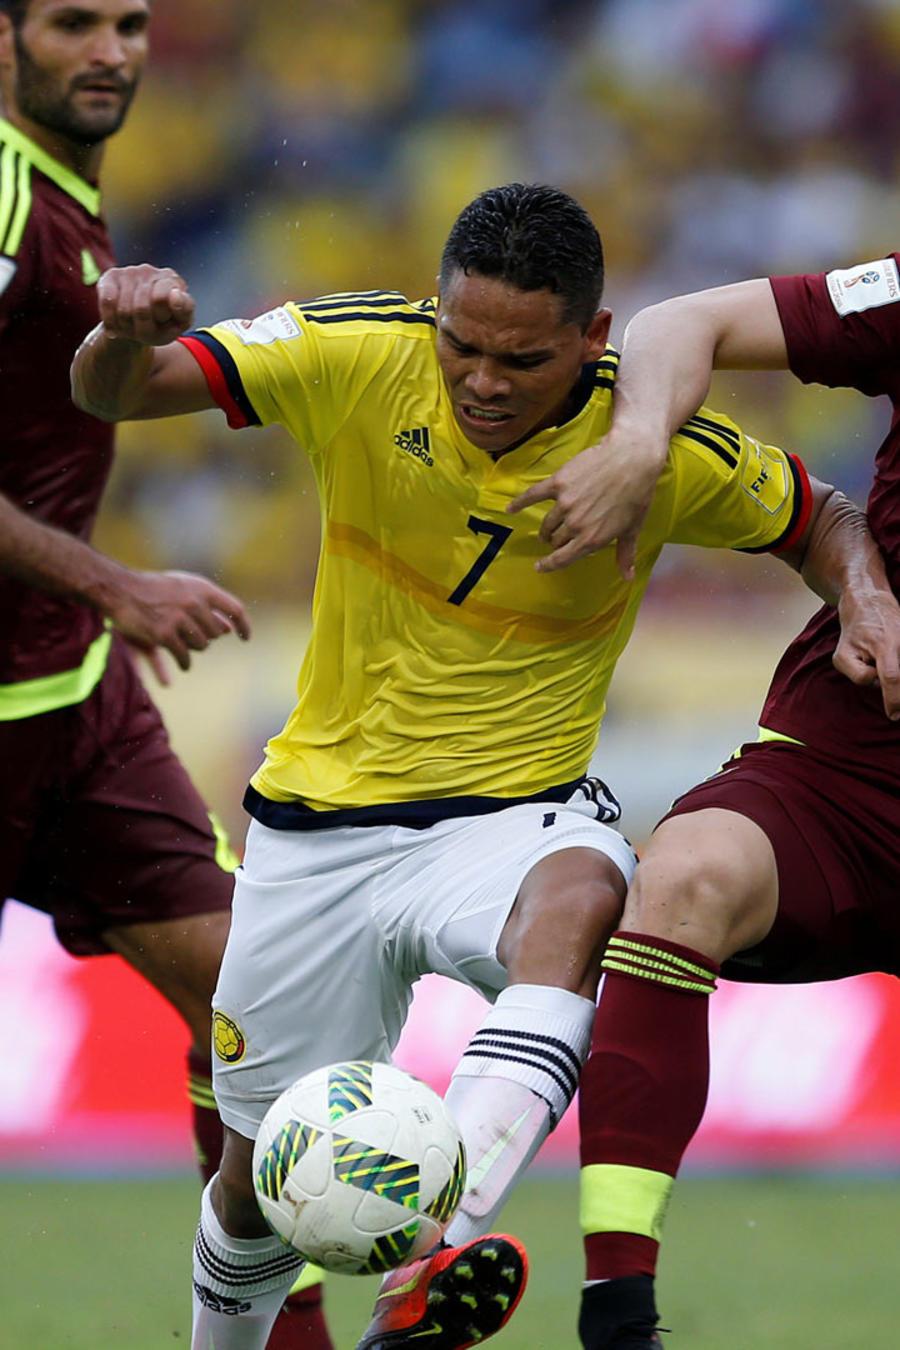 Futbol sudamericano: Colombia derrota 2-0 a Venezuela